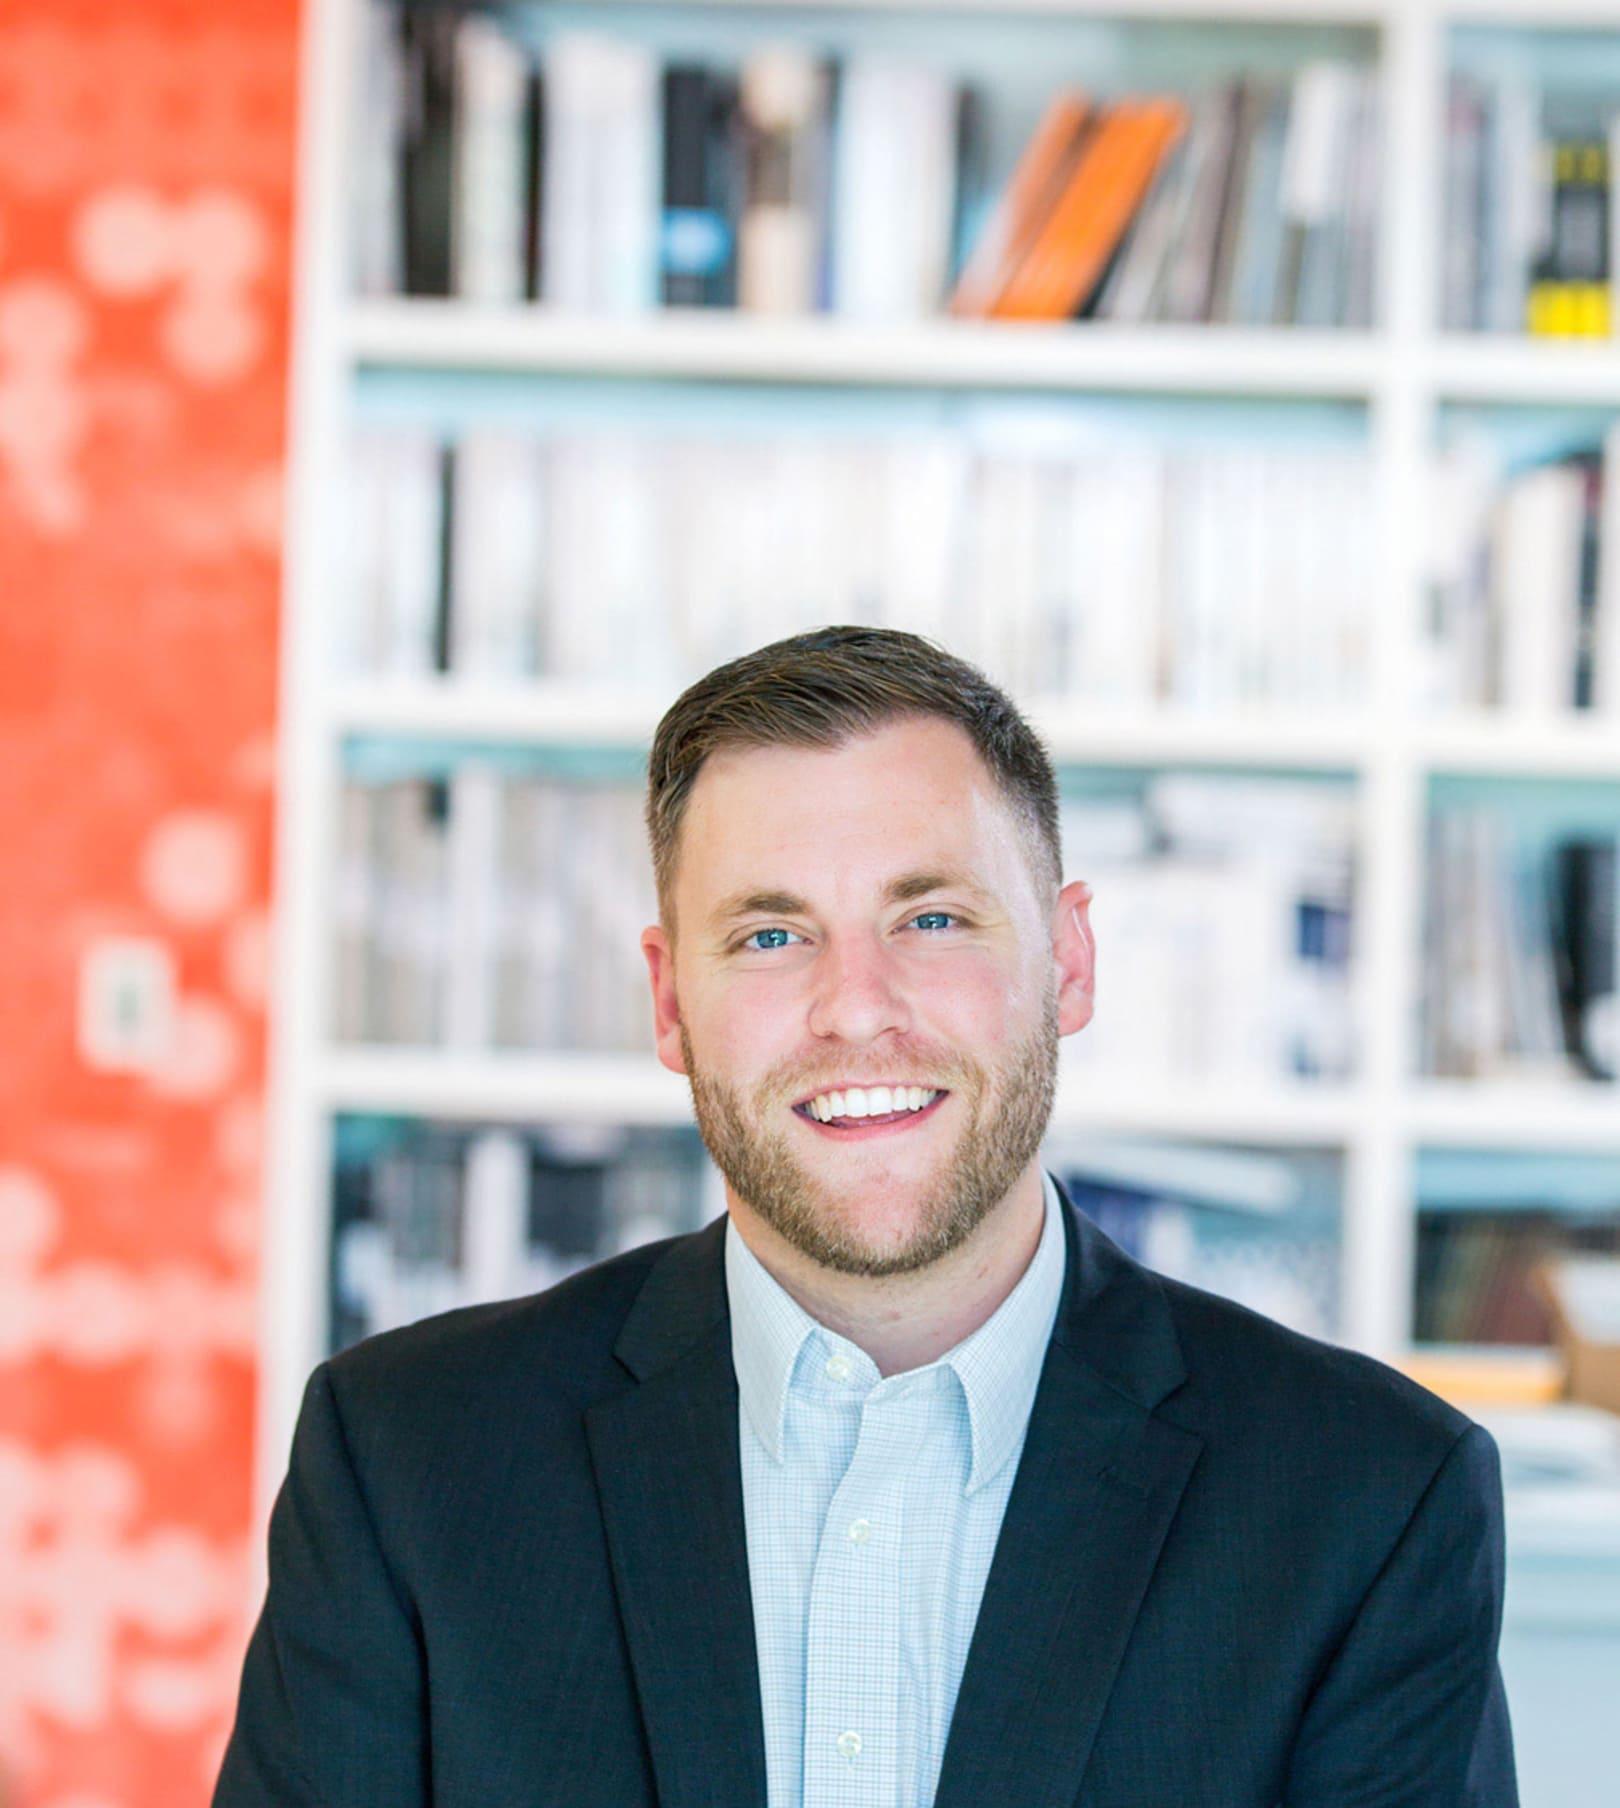 Matthew DeBoer, AIA - main image